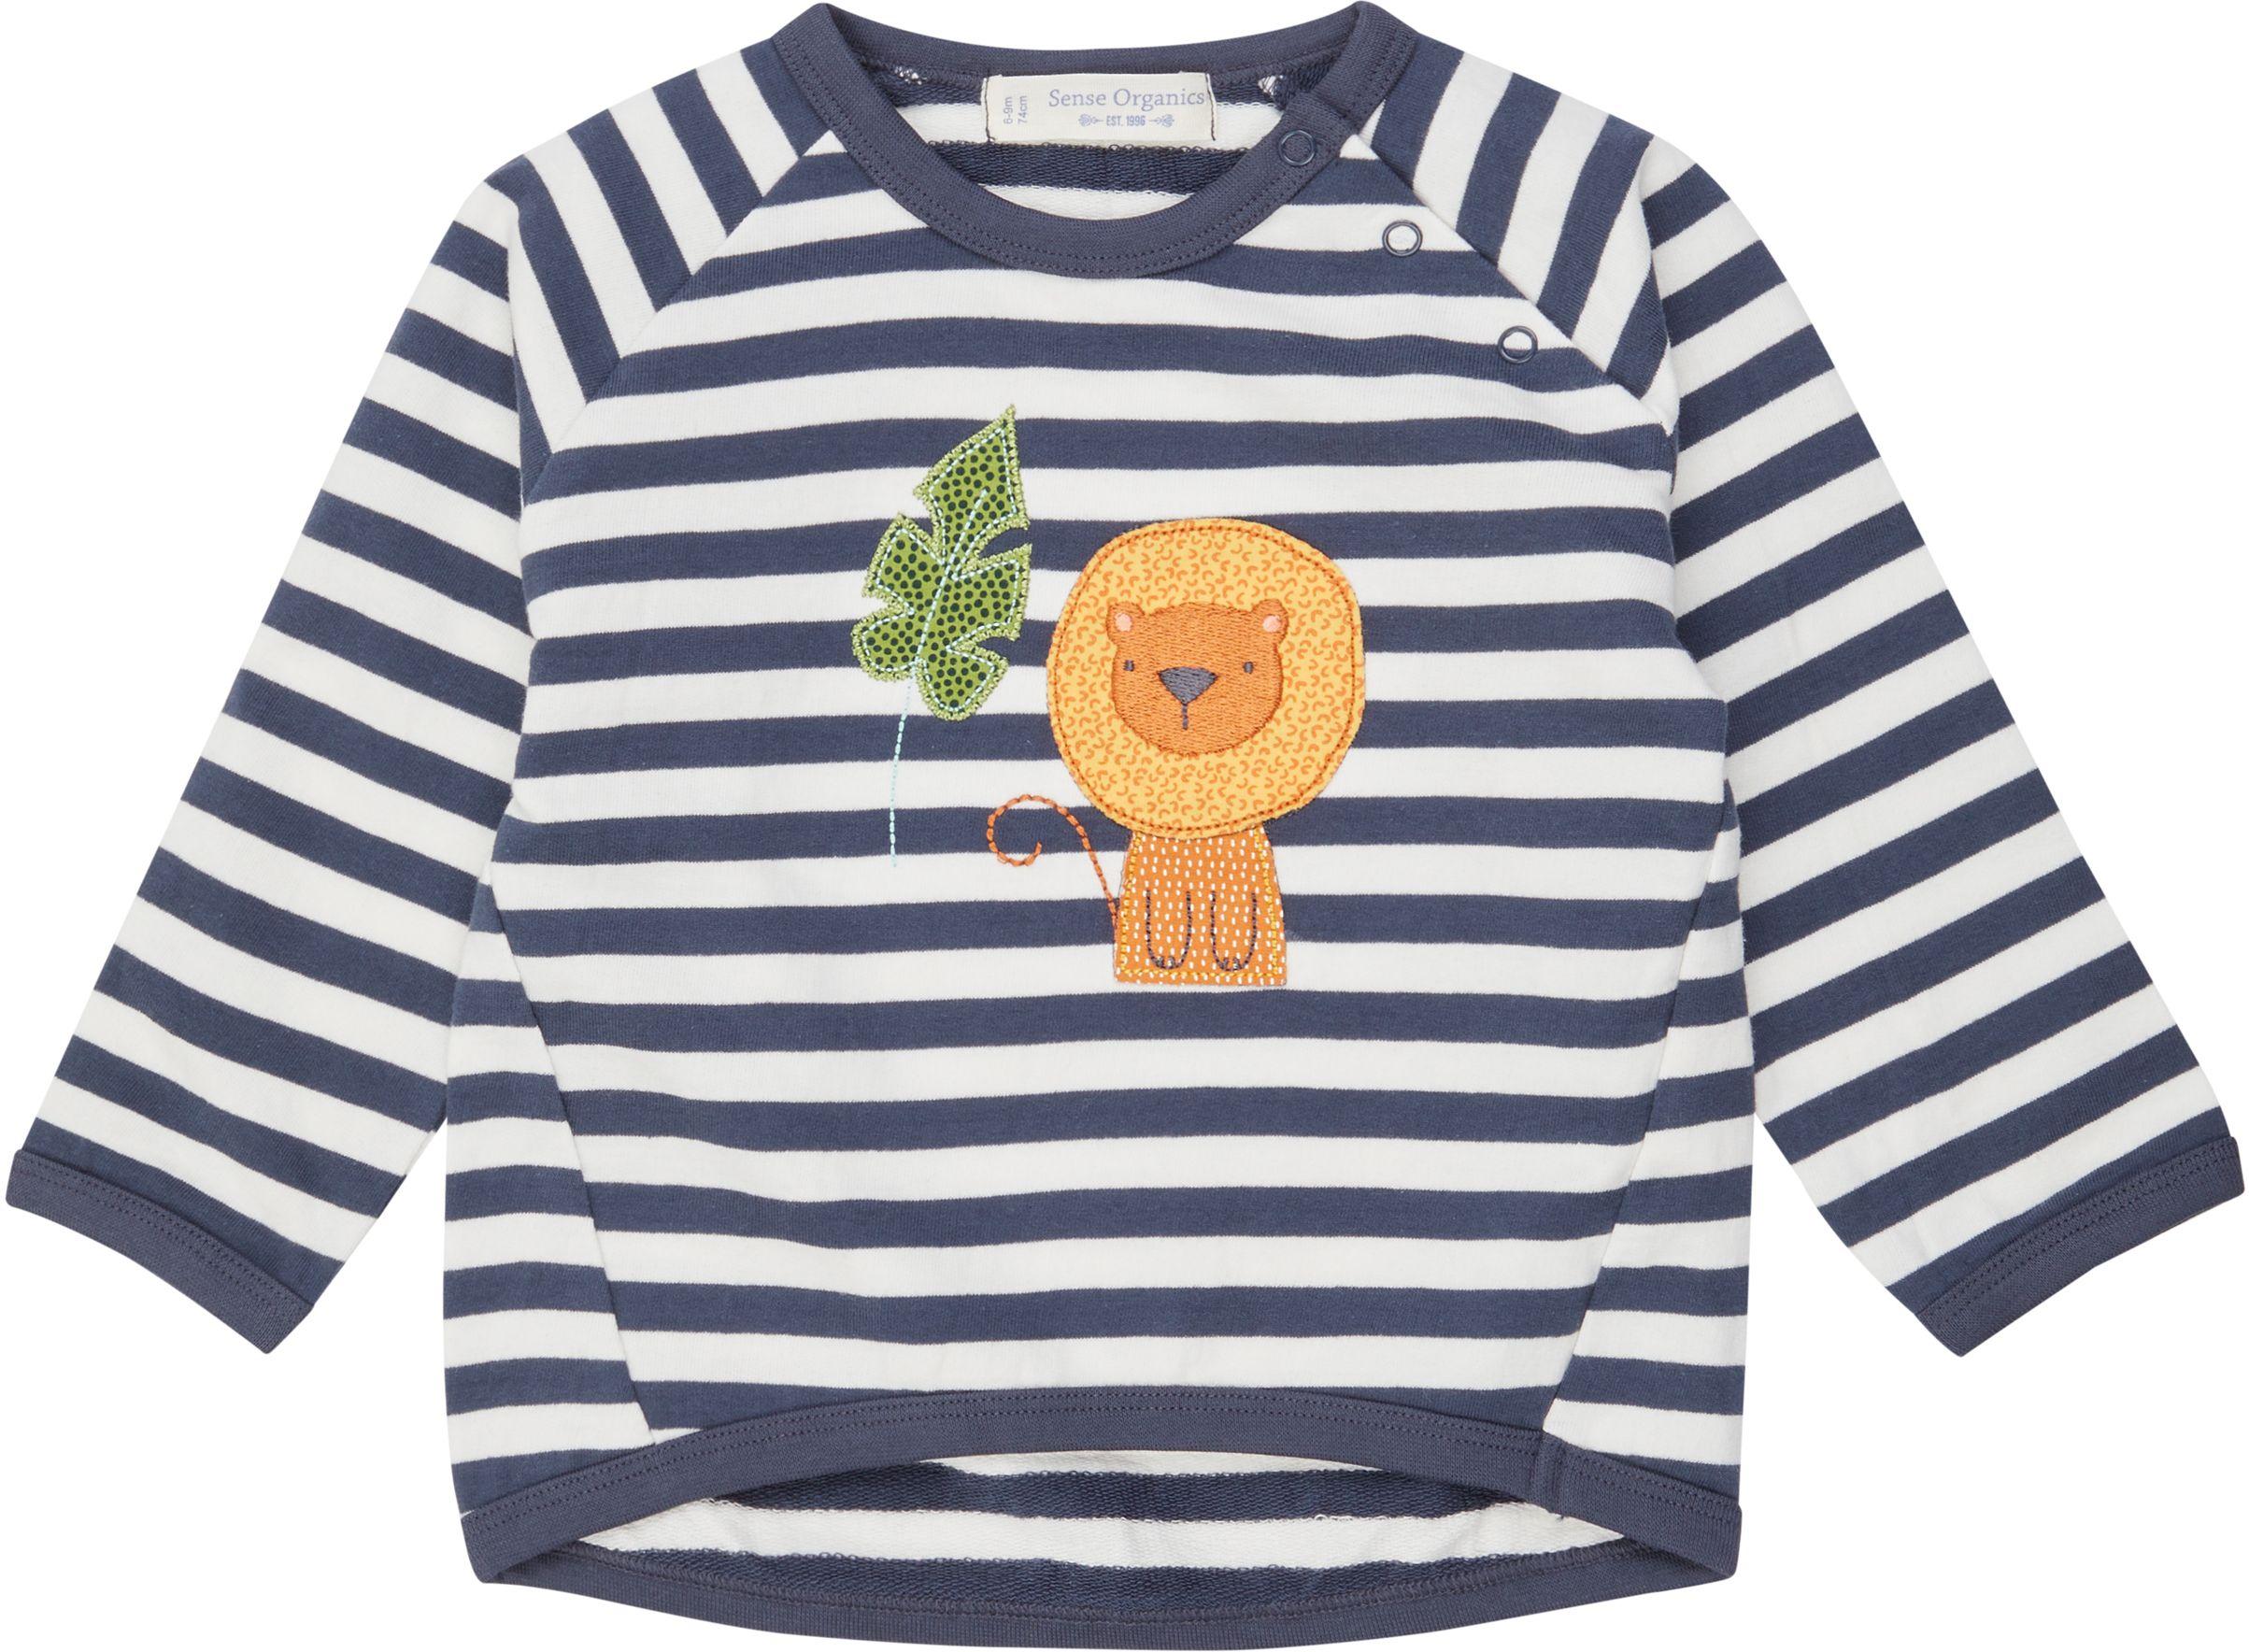 Sense Organic ETU Baby Sweater Navy Stripes